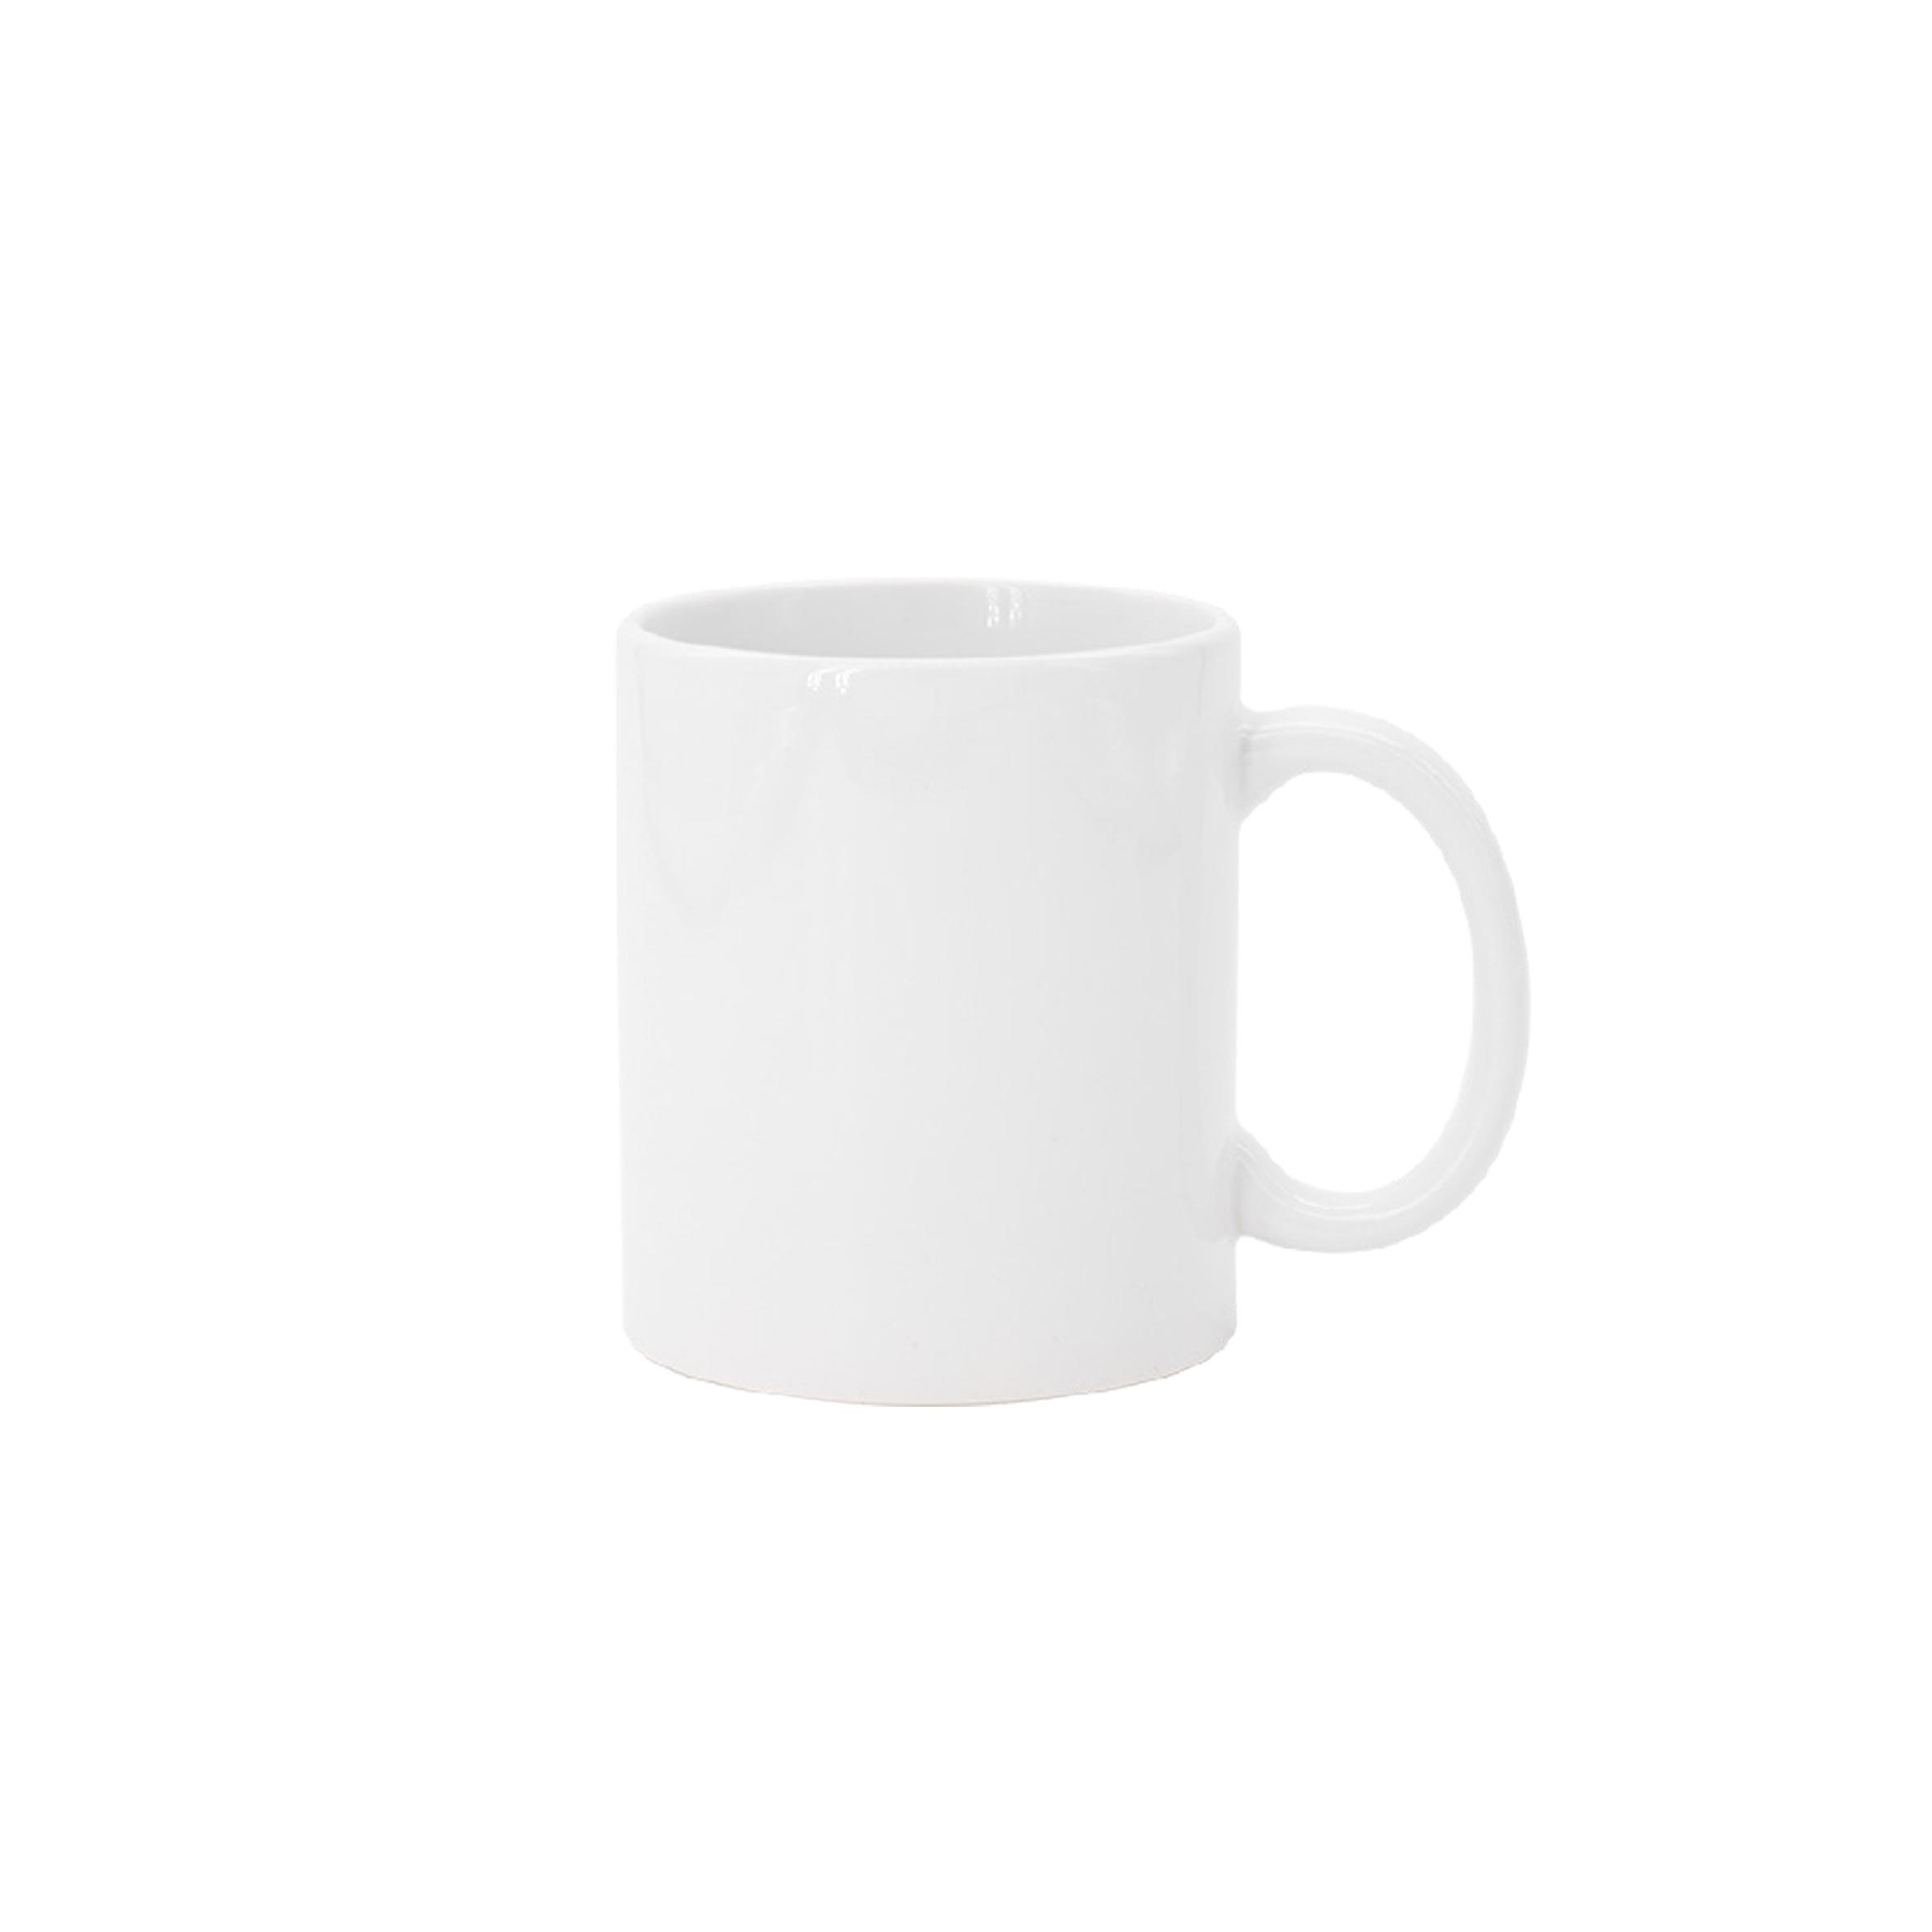 11 oz White Cup